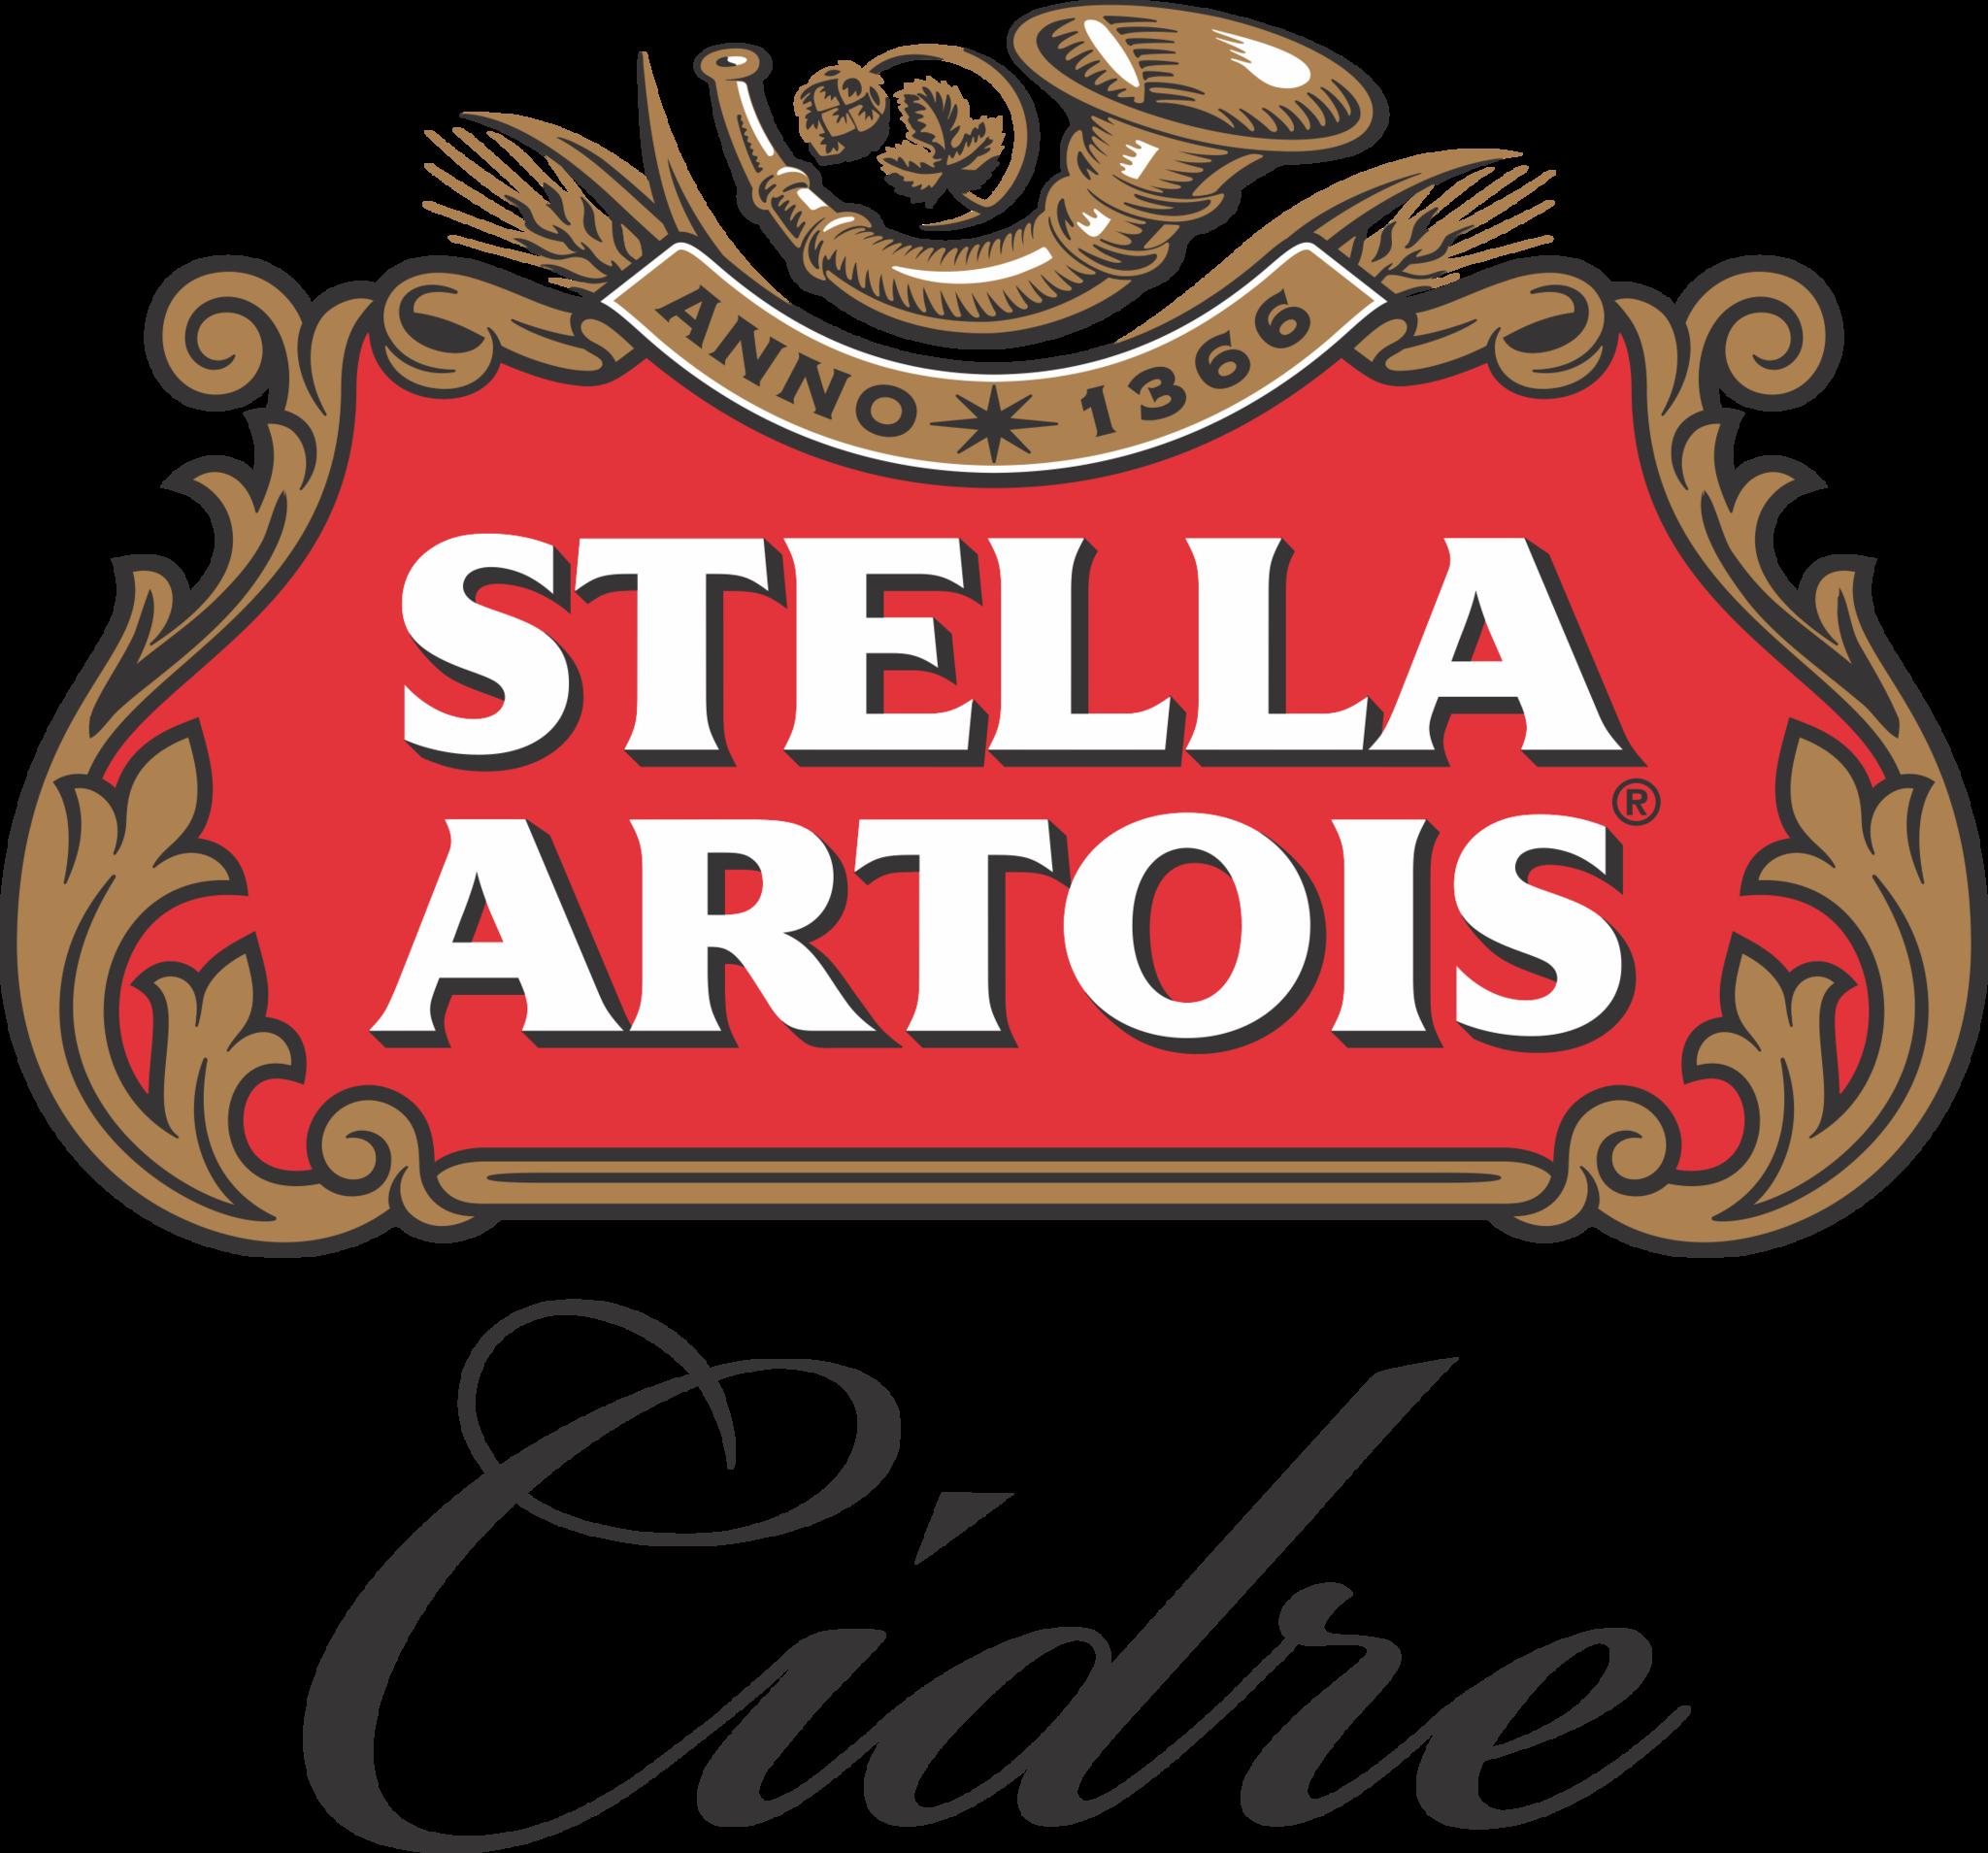 Stella-Cidre-Logo_8af7f238-684b-4c4c-976c-93f459fb14ca.png